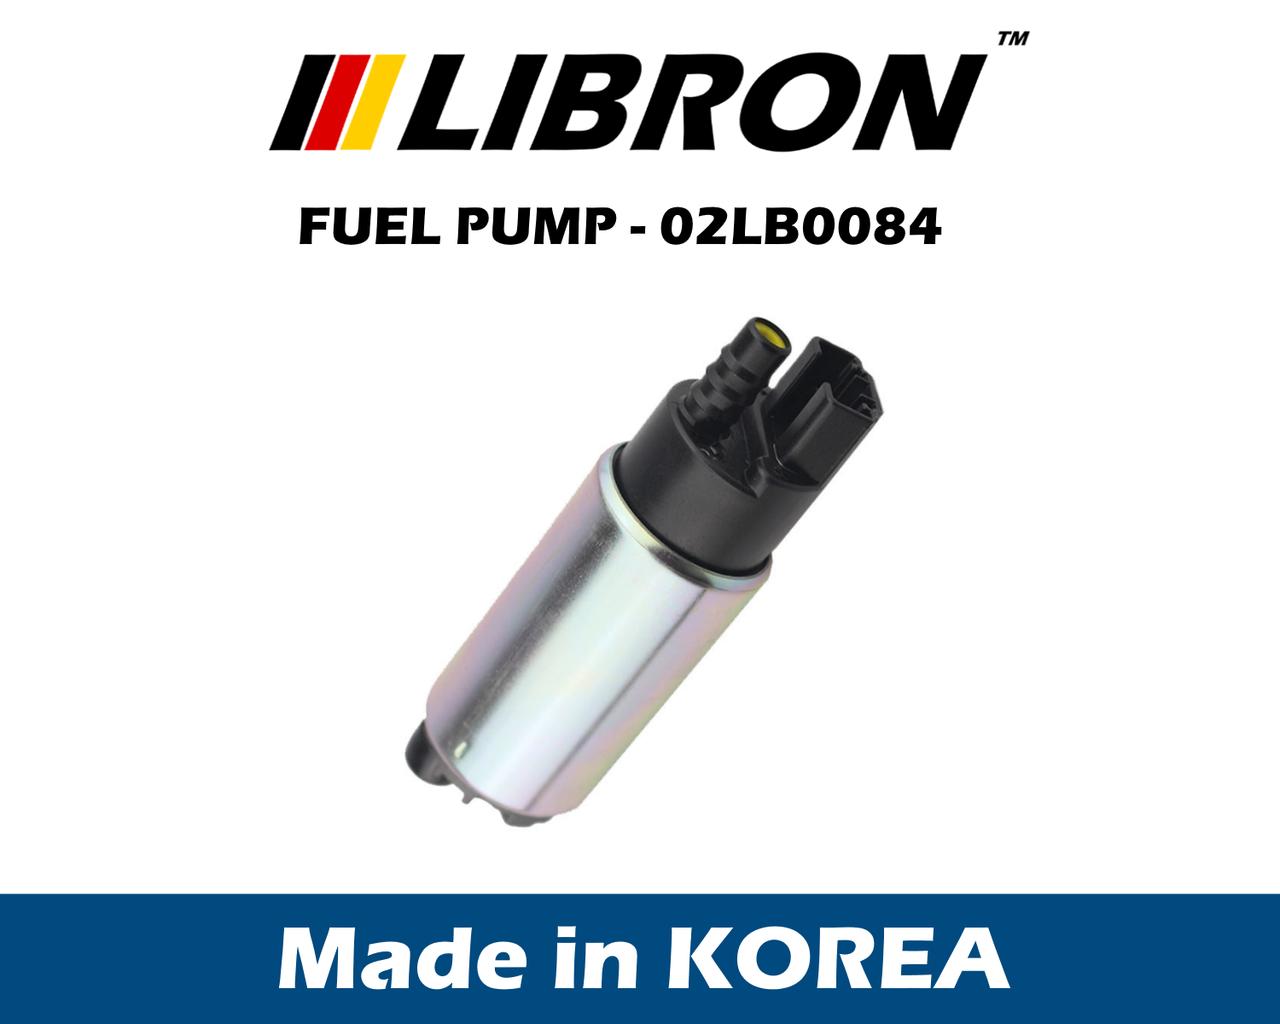 Топливный насос LIBRON 02LB0084 - MITSUBISHI SPACE RUNNER